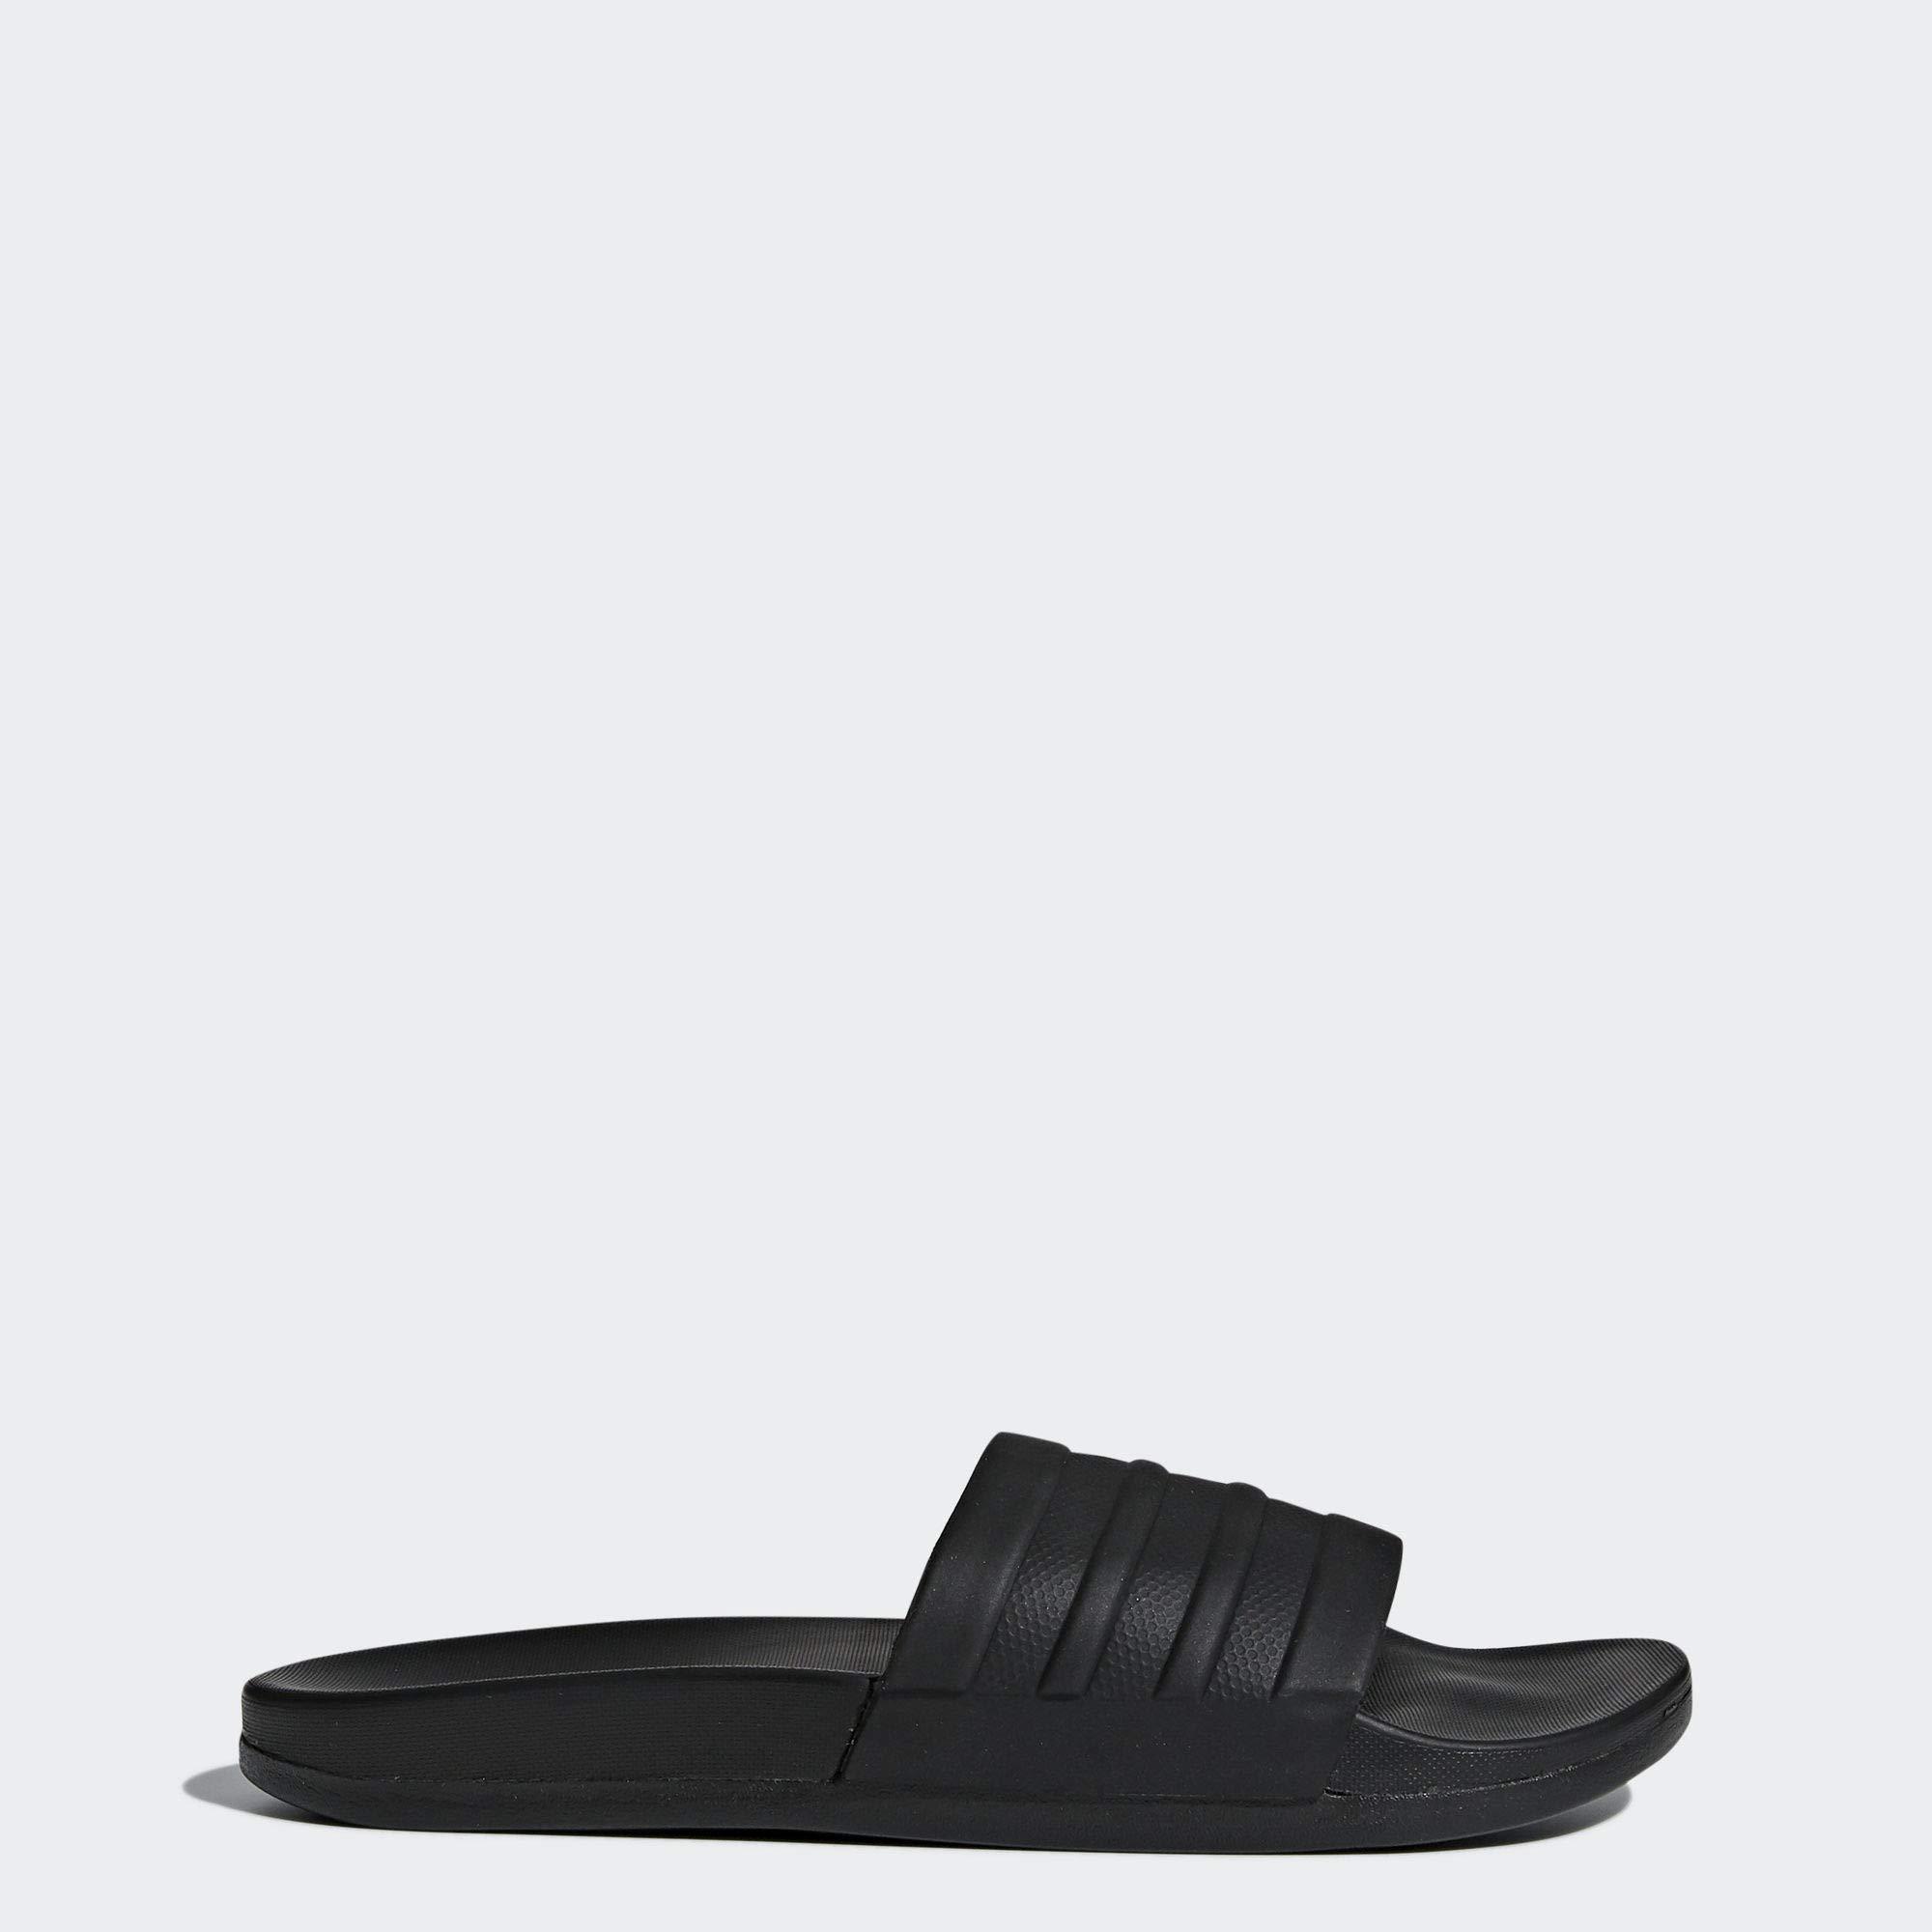 adidas Women's Adilette Comfort Slide Sandal, Black, 7 M US by adidas